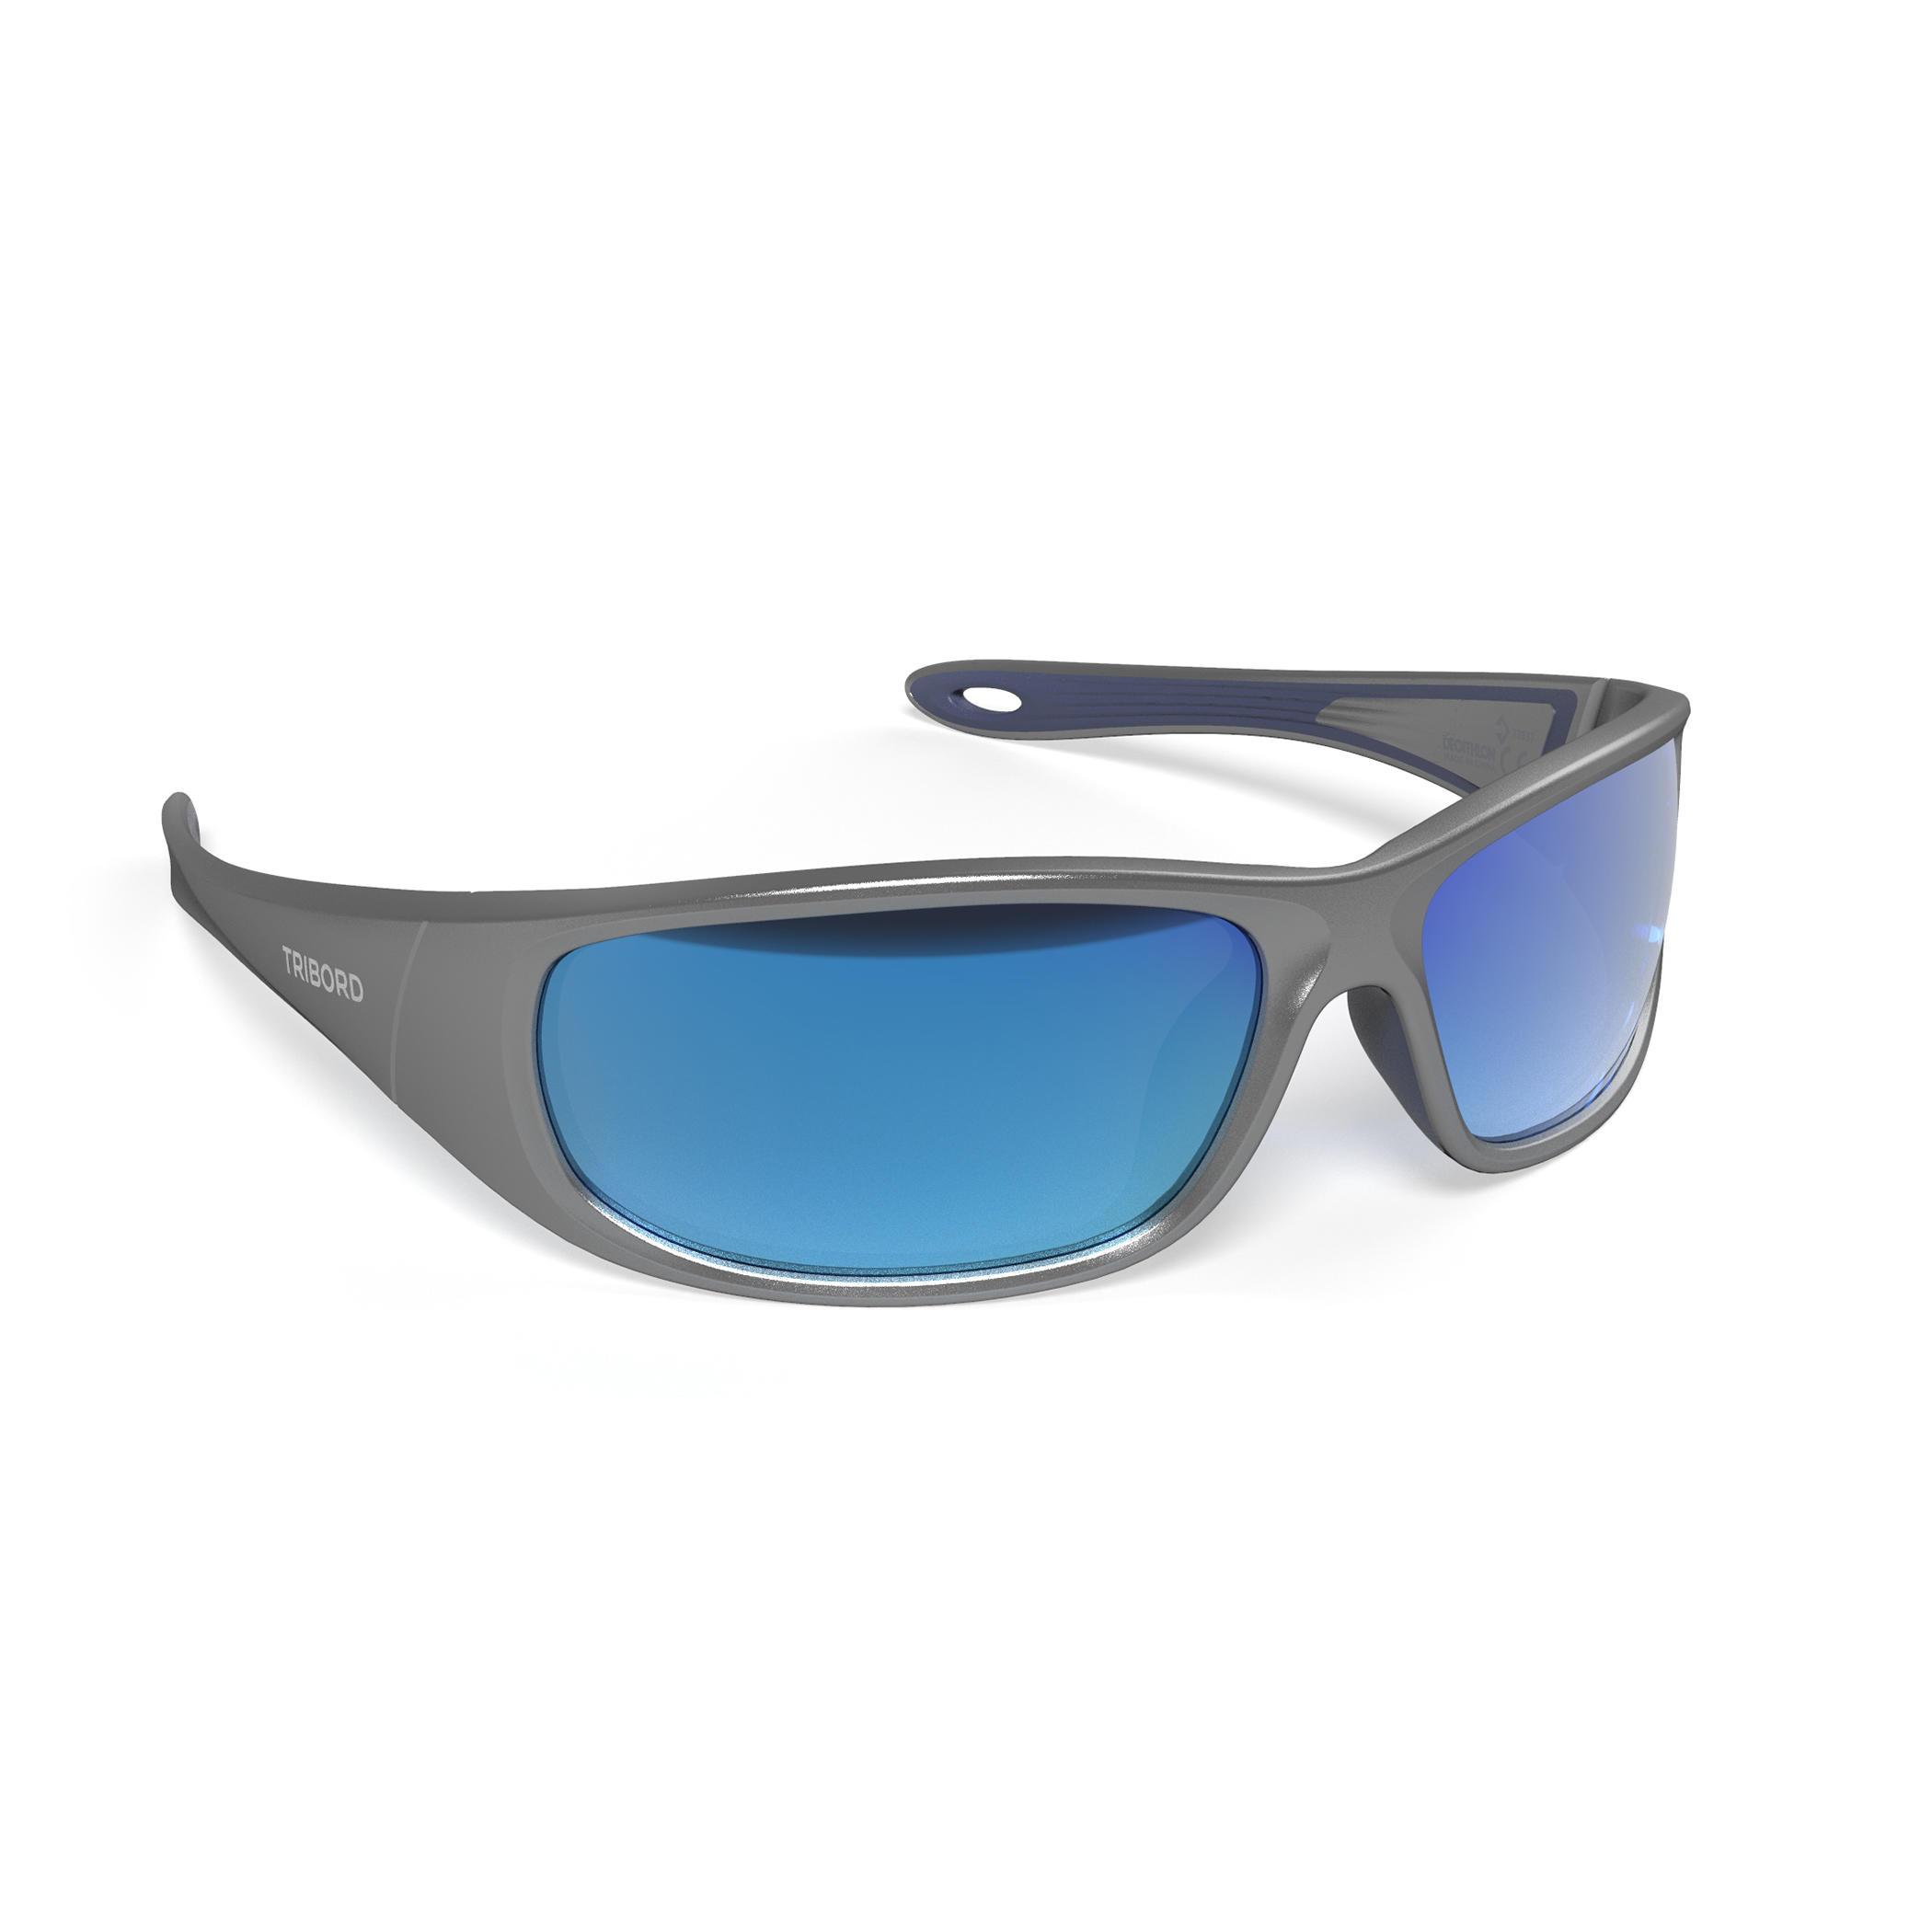 2c39fac78a62ae Tribord Watersportbril 900 voor volwassenen grijs